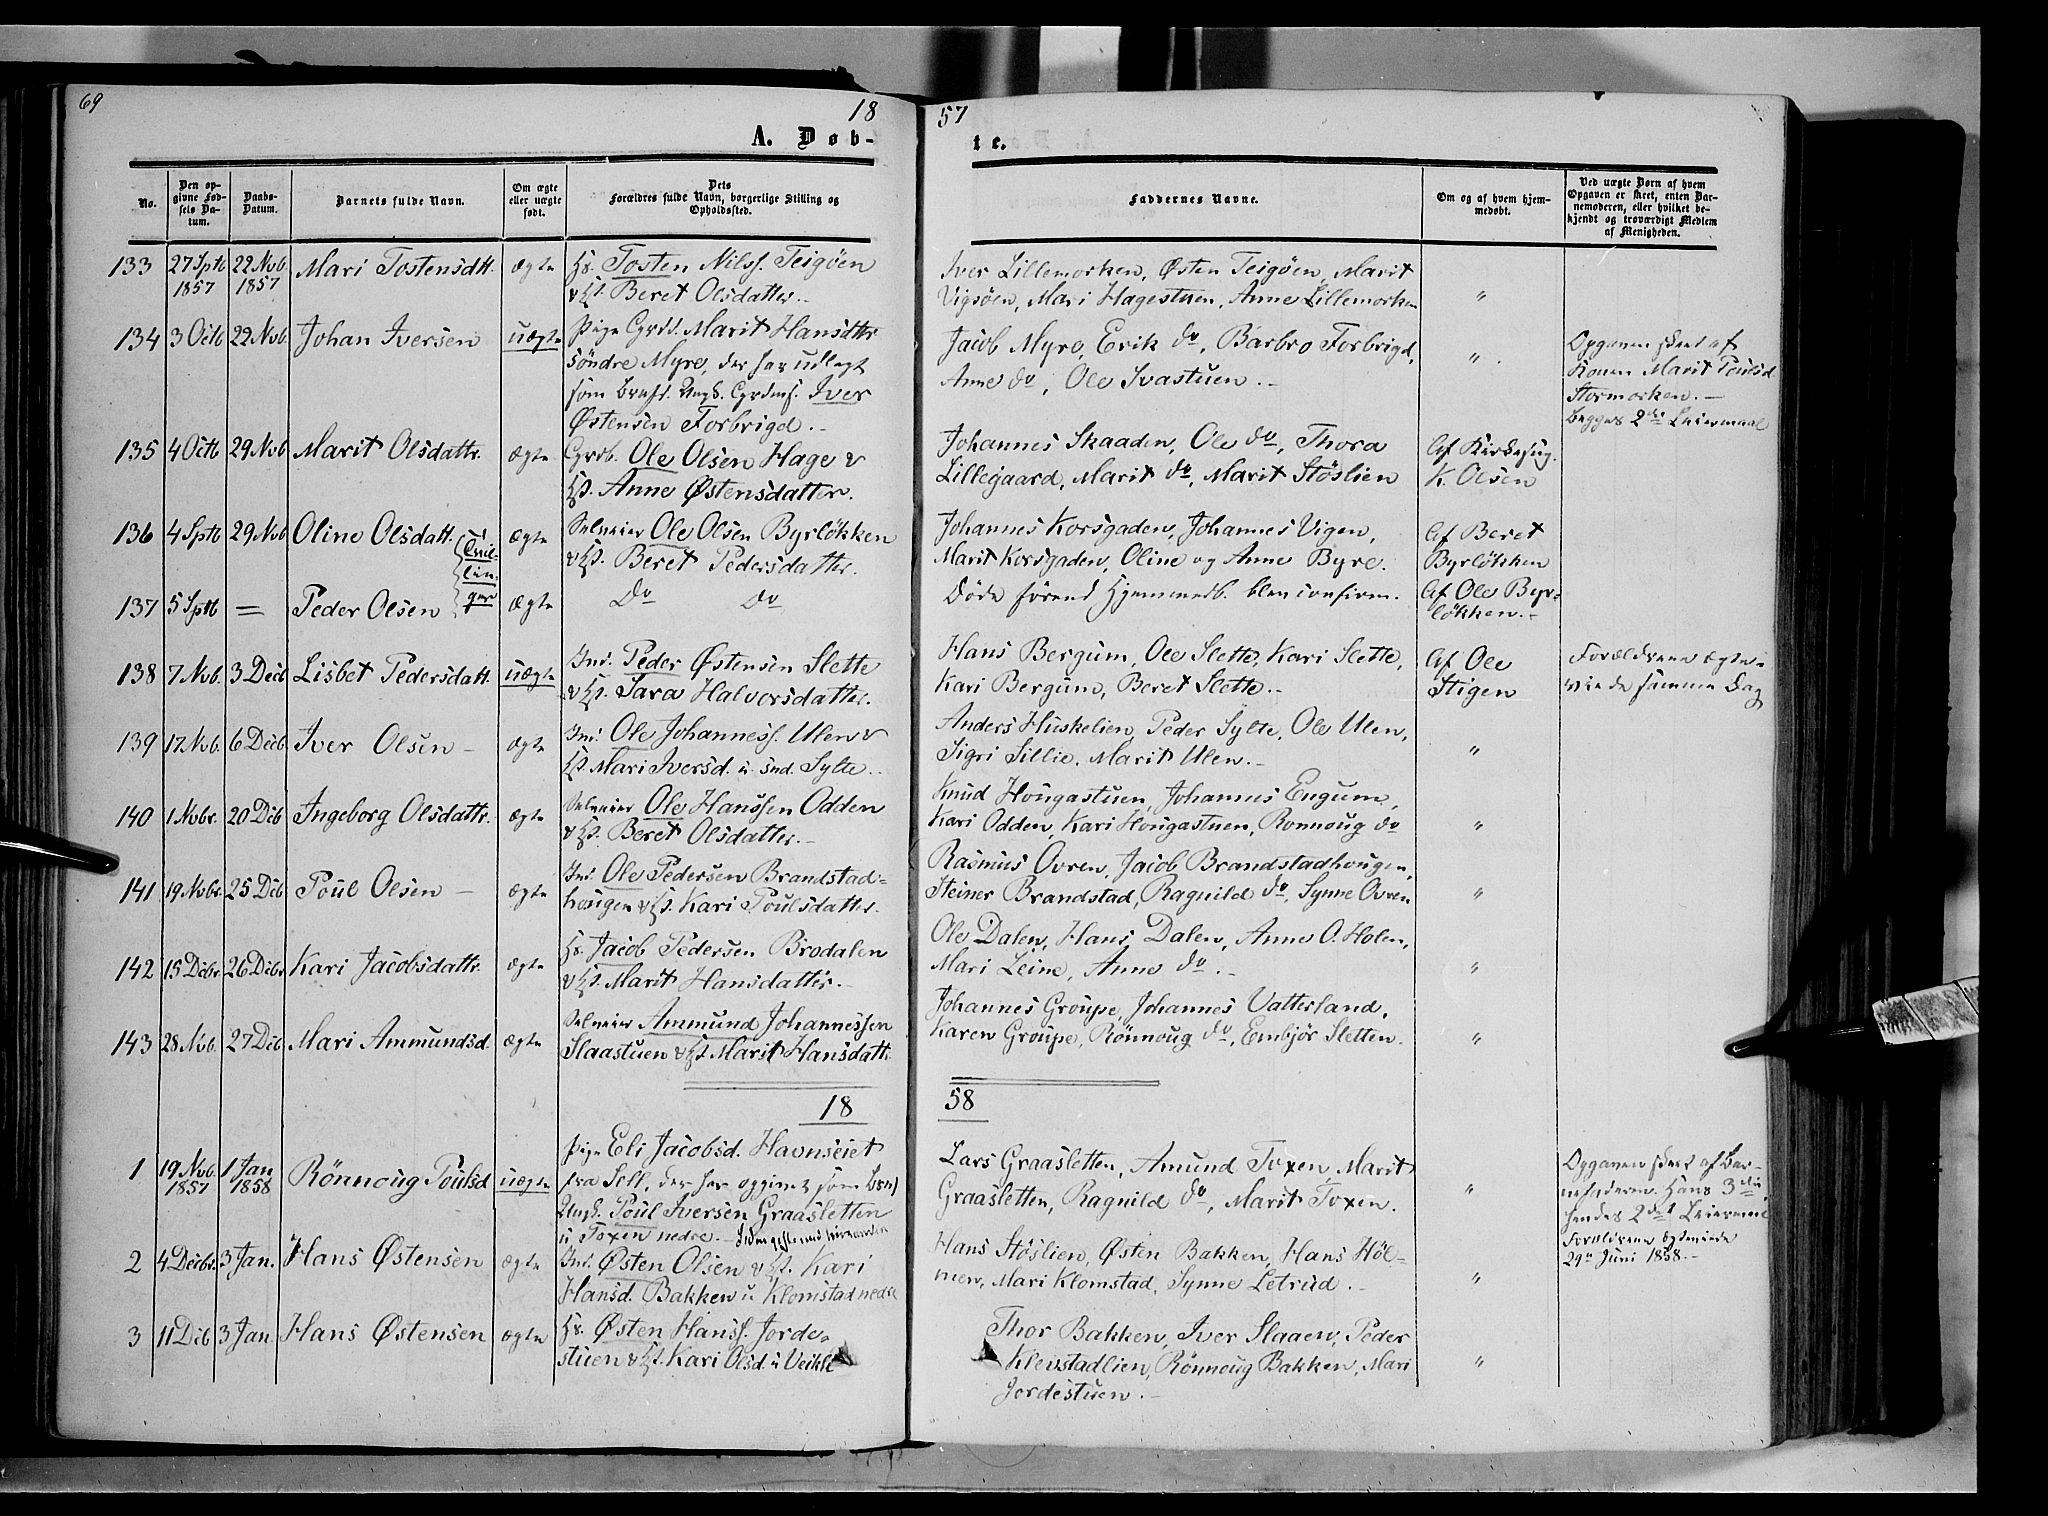 SAH, Nord-Fron prestekontor, Ministerialbok nr. 1, 1851-1864, s. 69